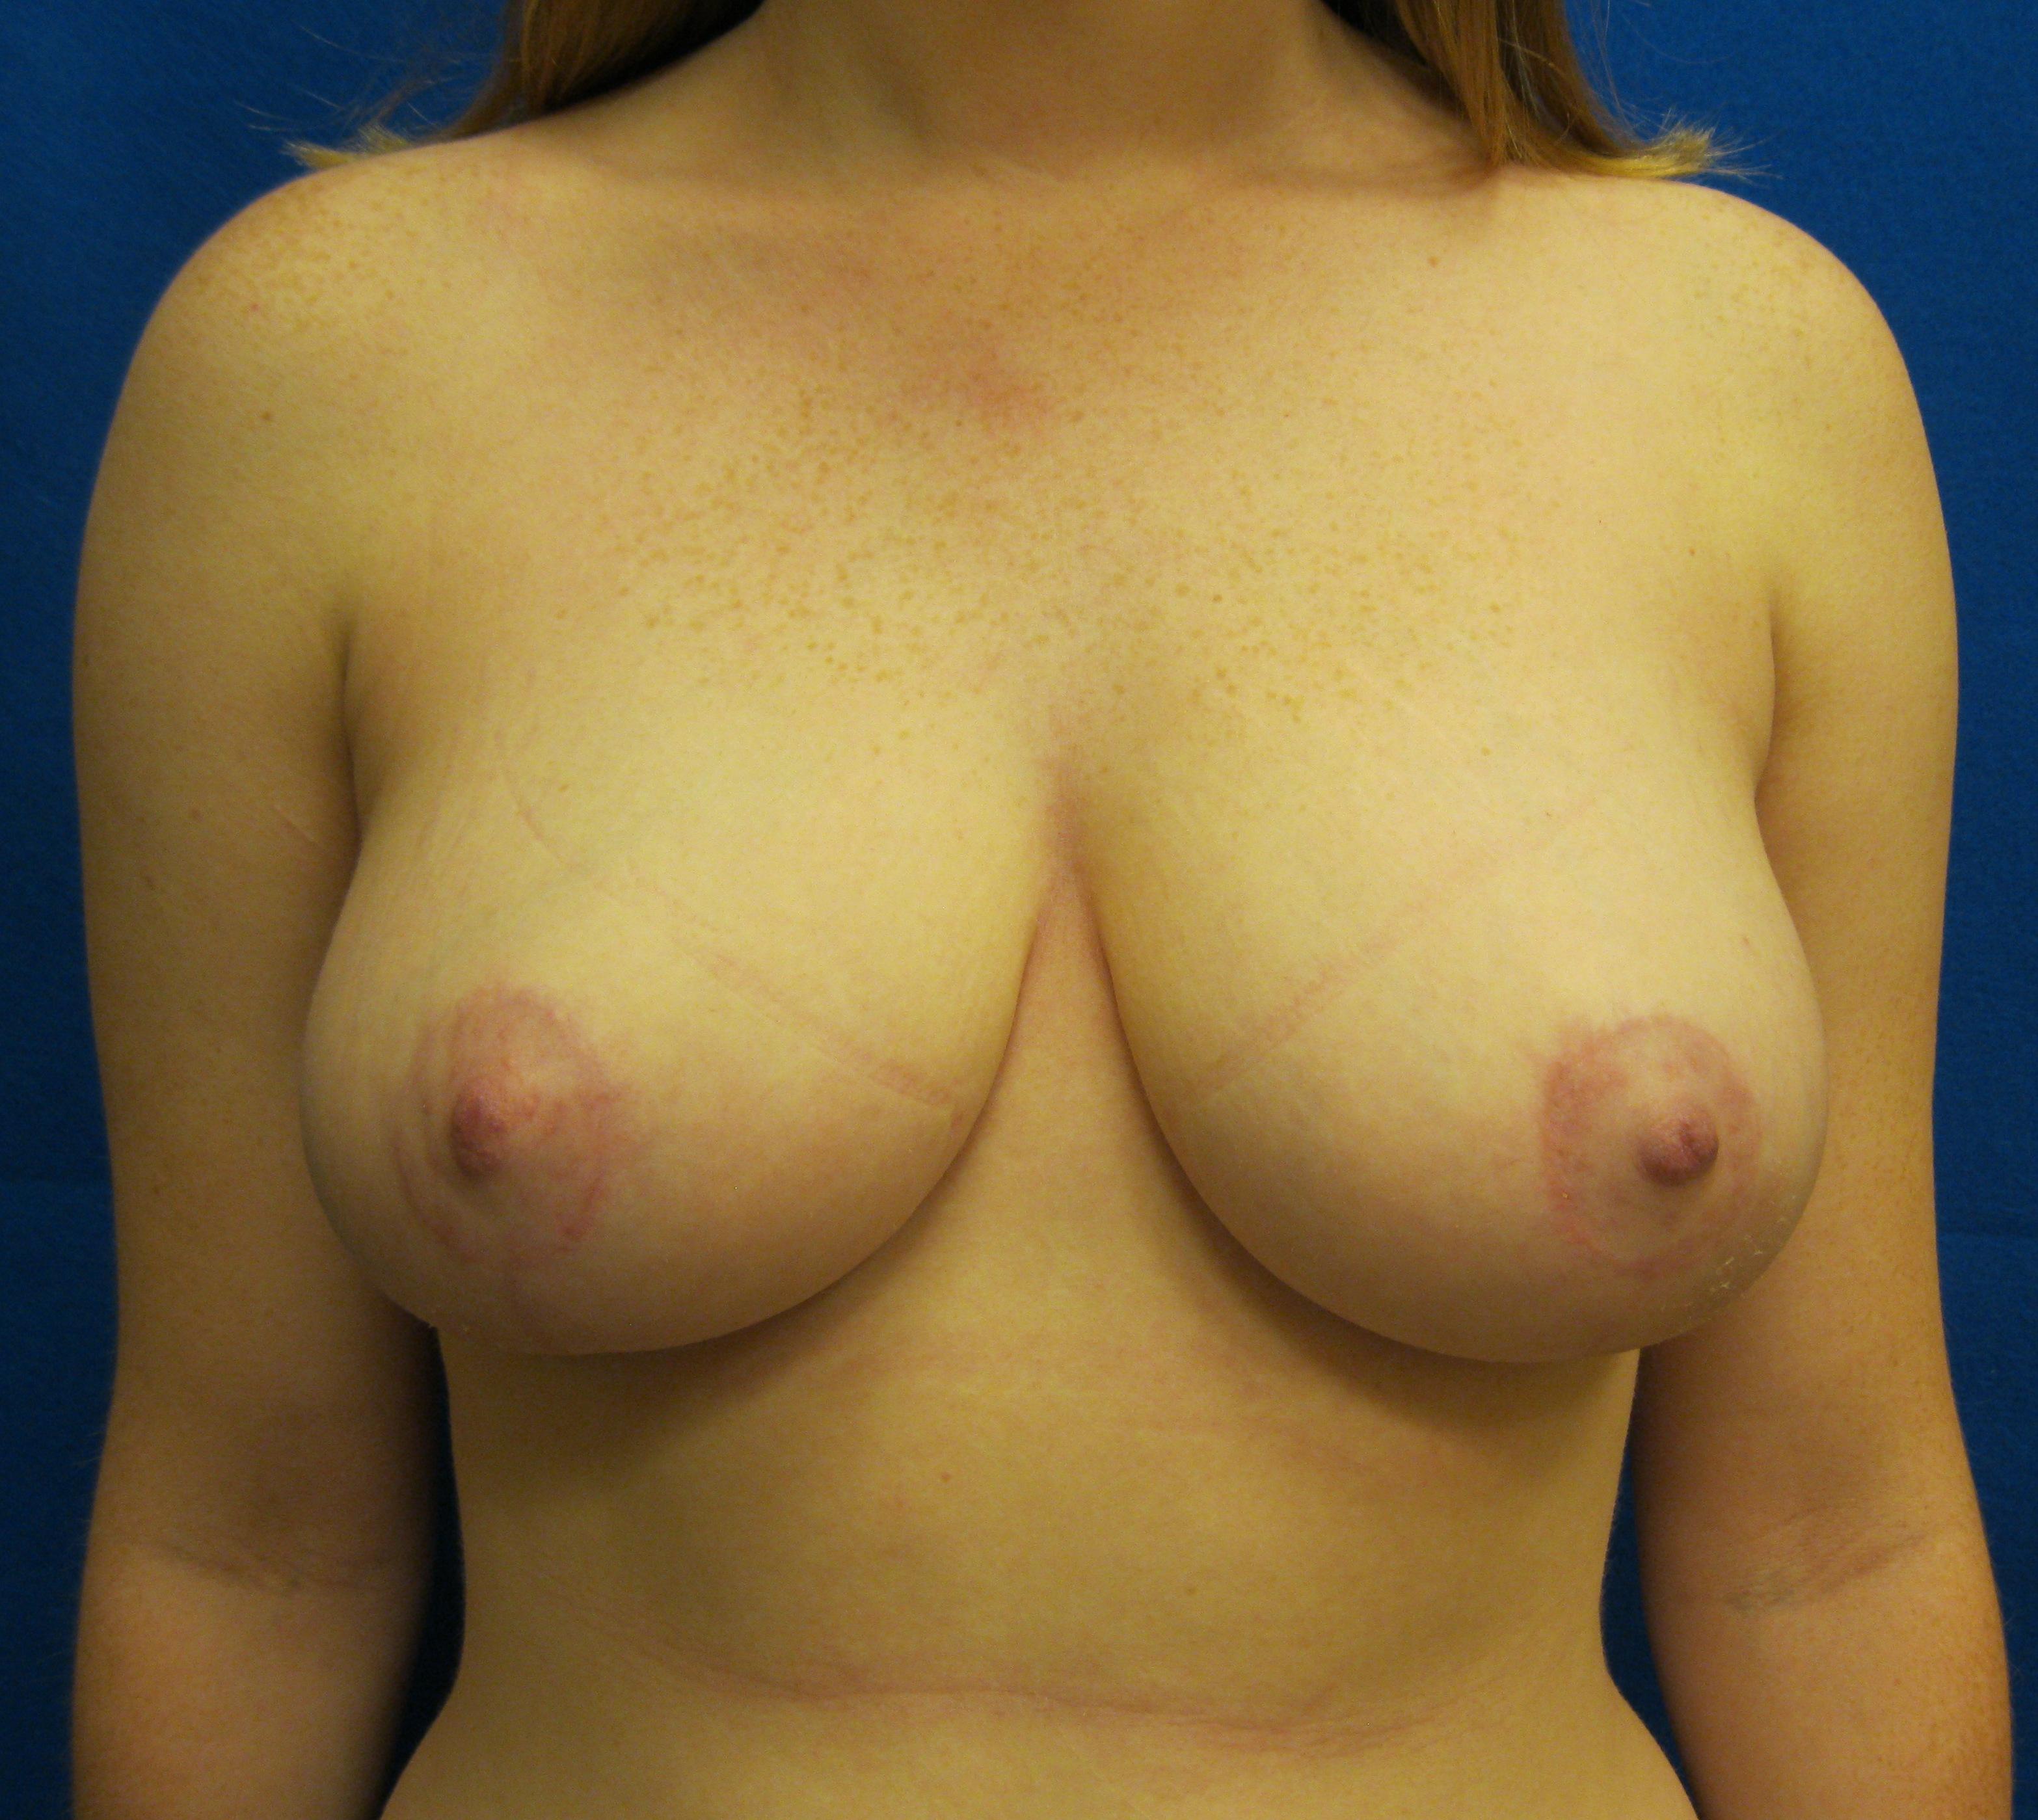 breast reduction surgery scars fairfield bridgeport connecticut jandali plastic surgery